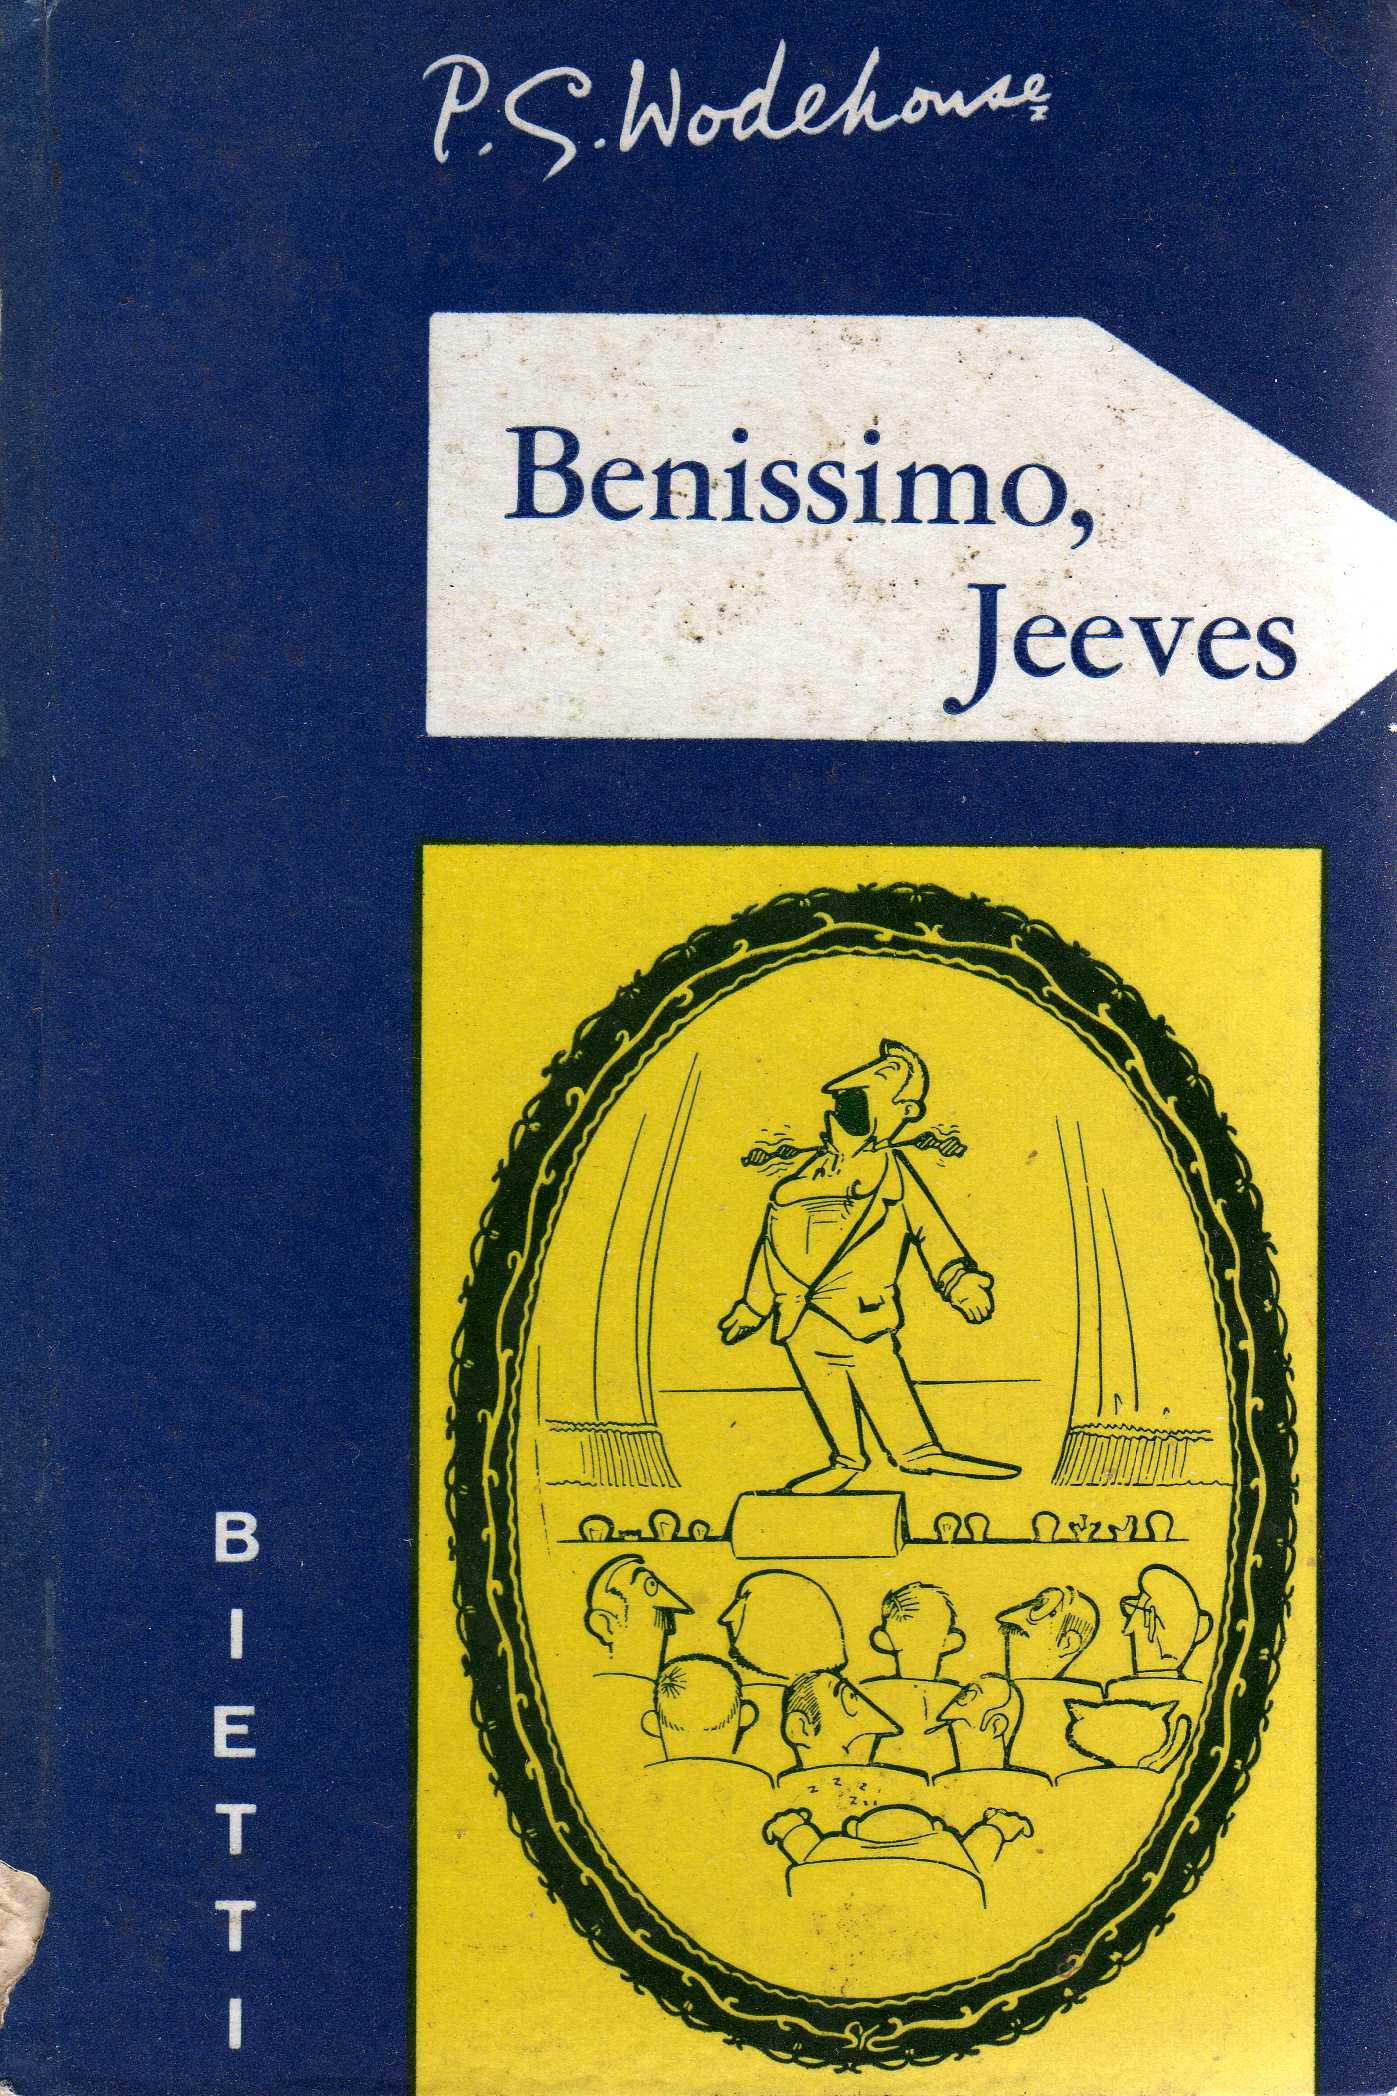 Benissimo, Jeeves